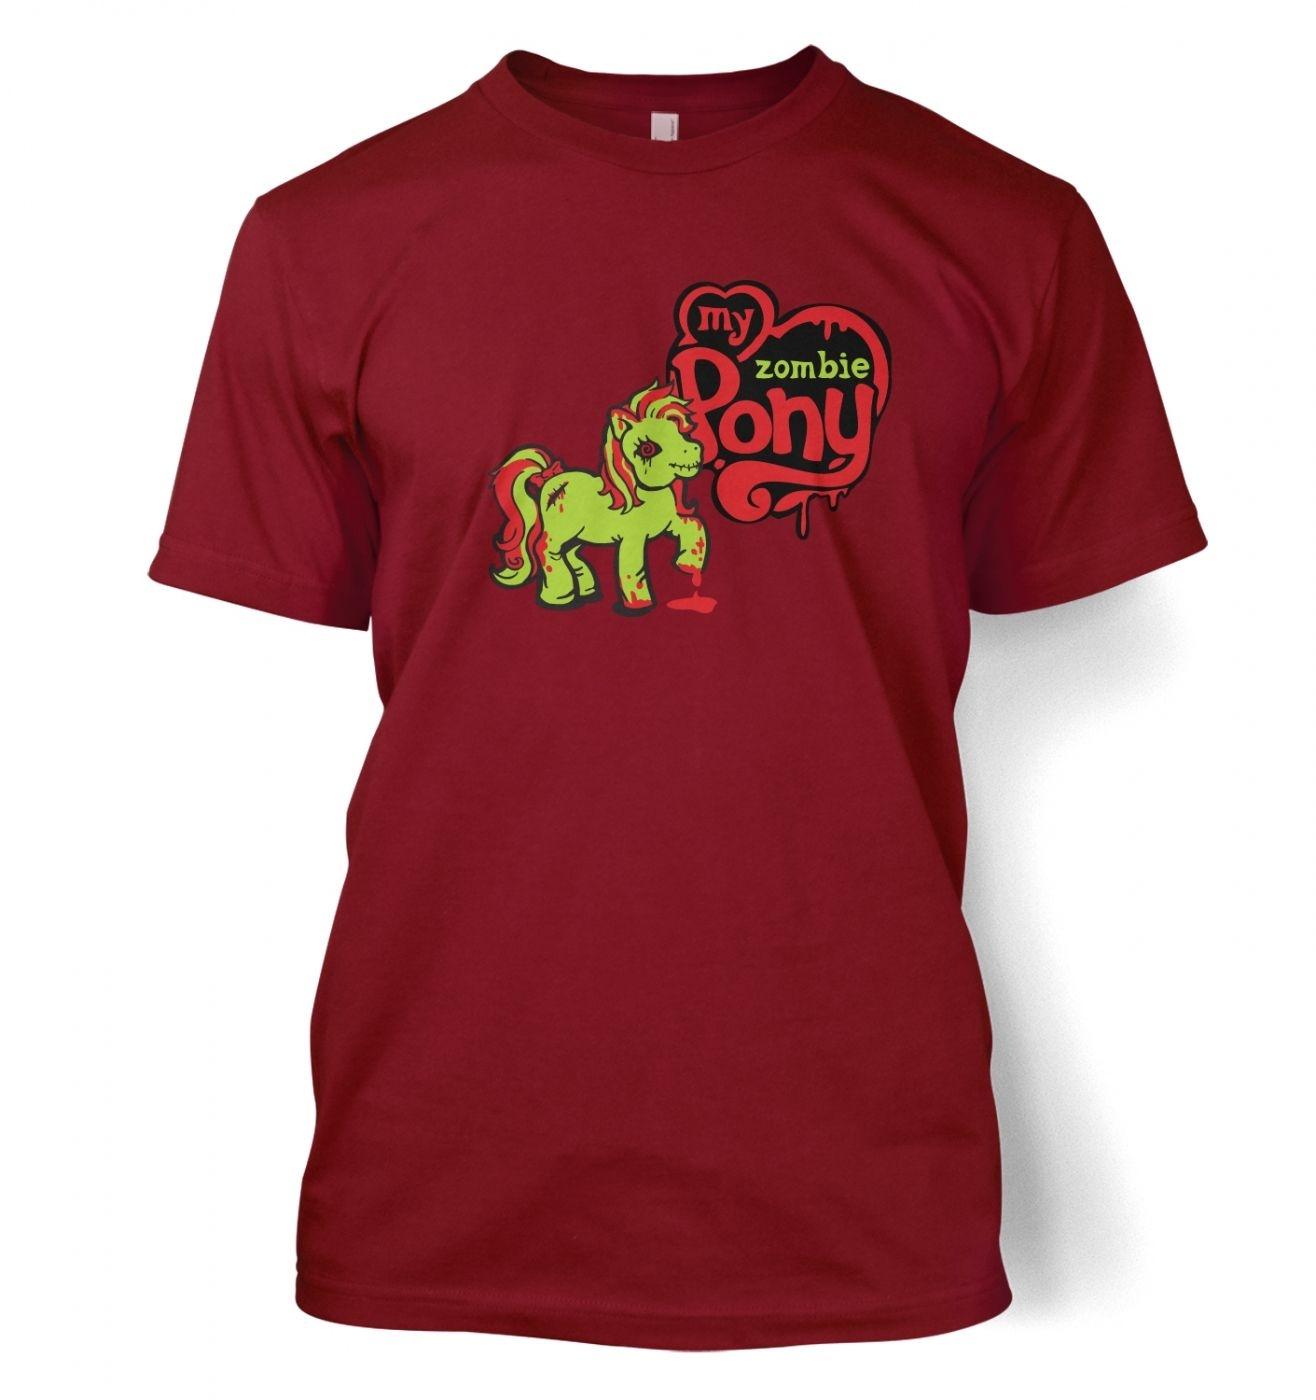 My Zombie Pony t-shirt- inspired by My Little Pony